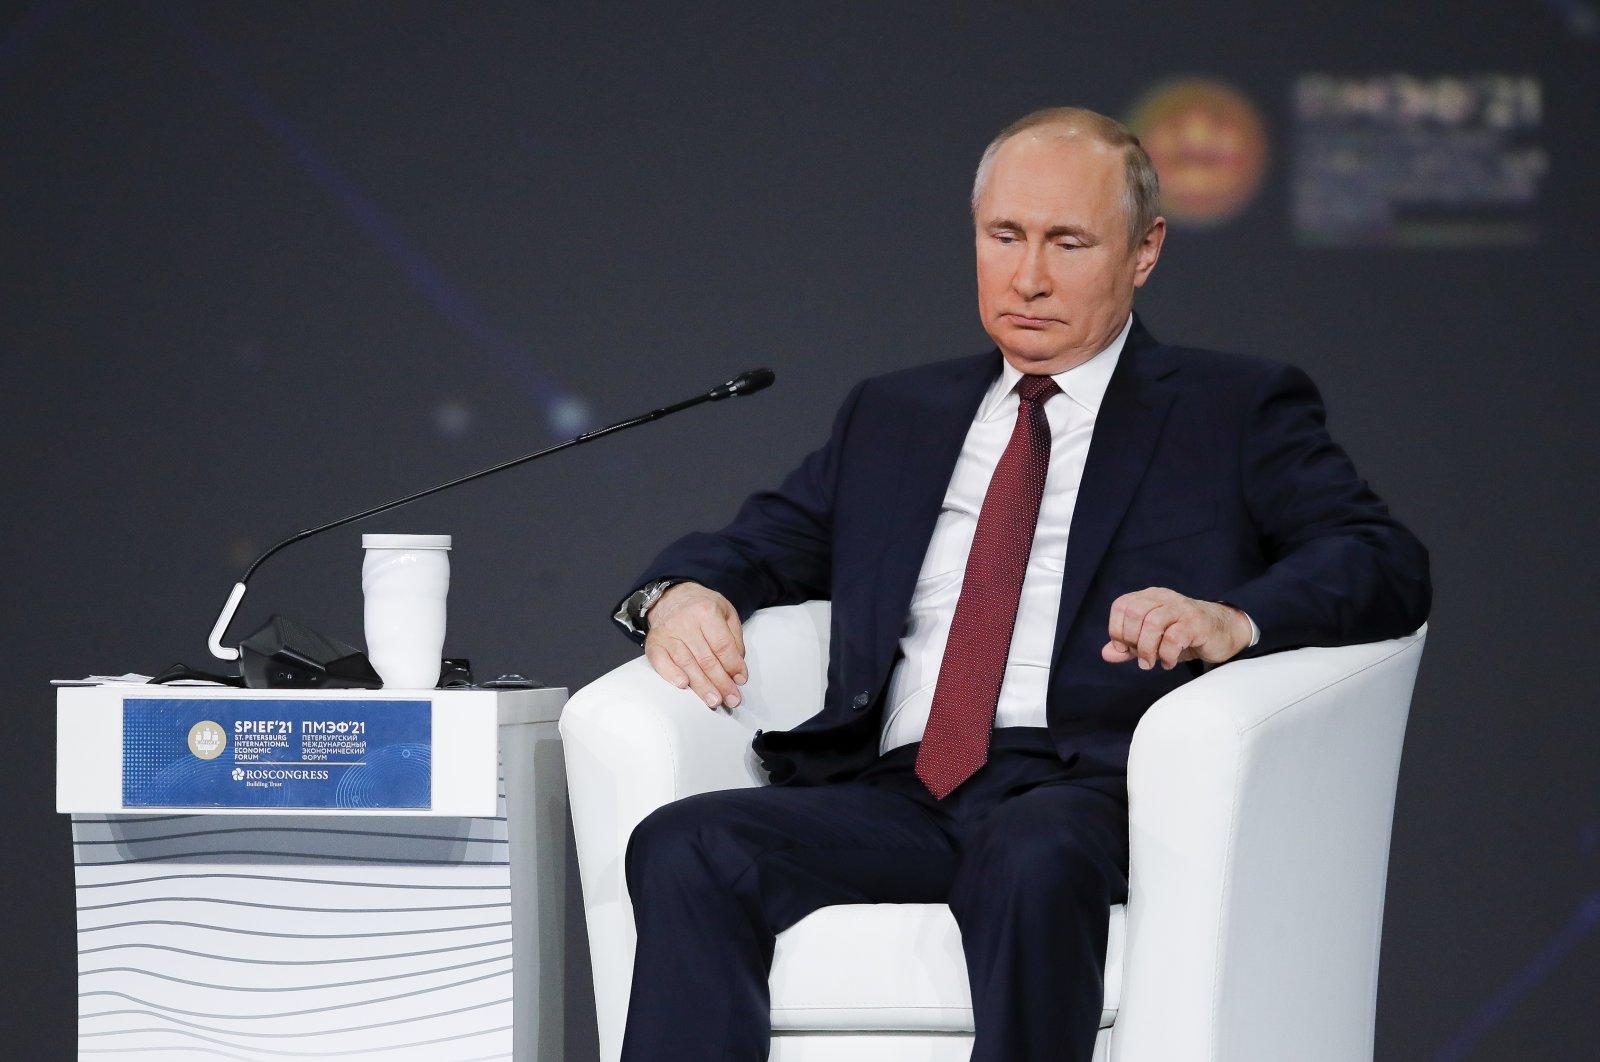 Russian President Vladimir Putin attends the St. Petersburg International Economic Forum in St. Petersburg, Russia, June 4, 2021. (AP Photo)